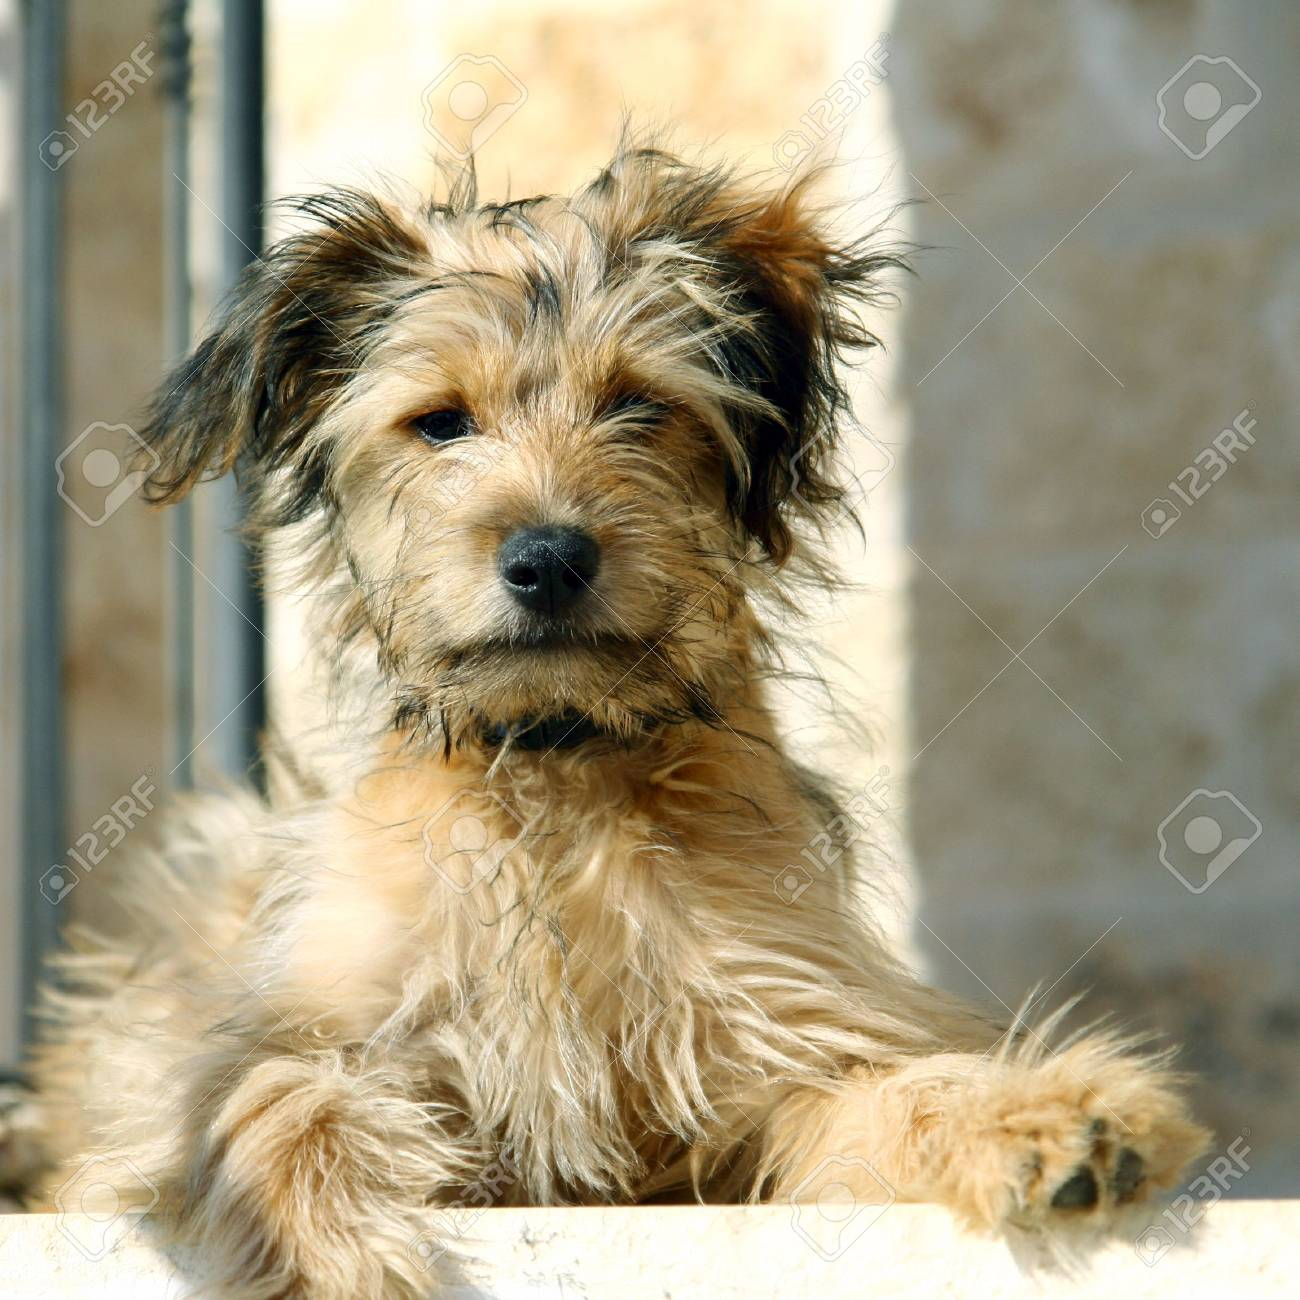 sitting on stairs dog Stock Photo - 1194905